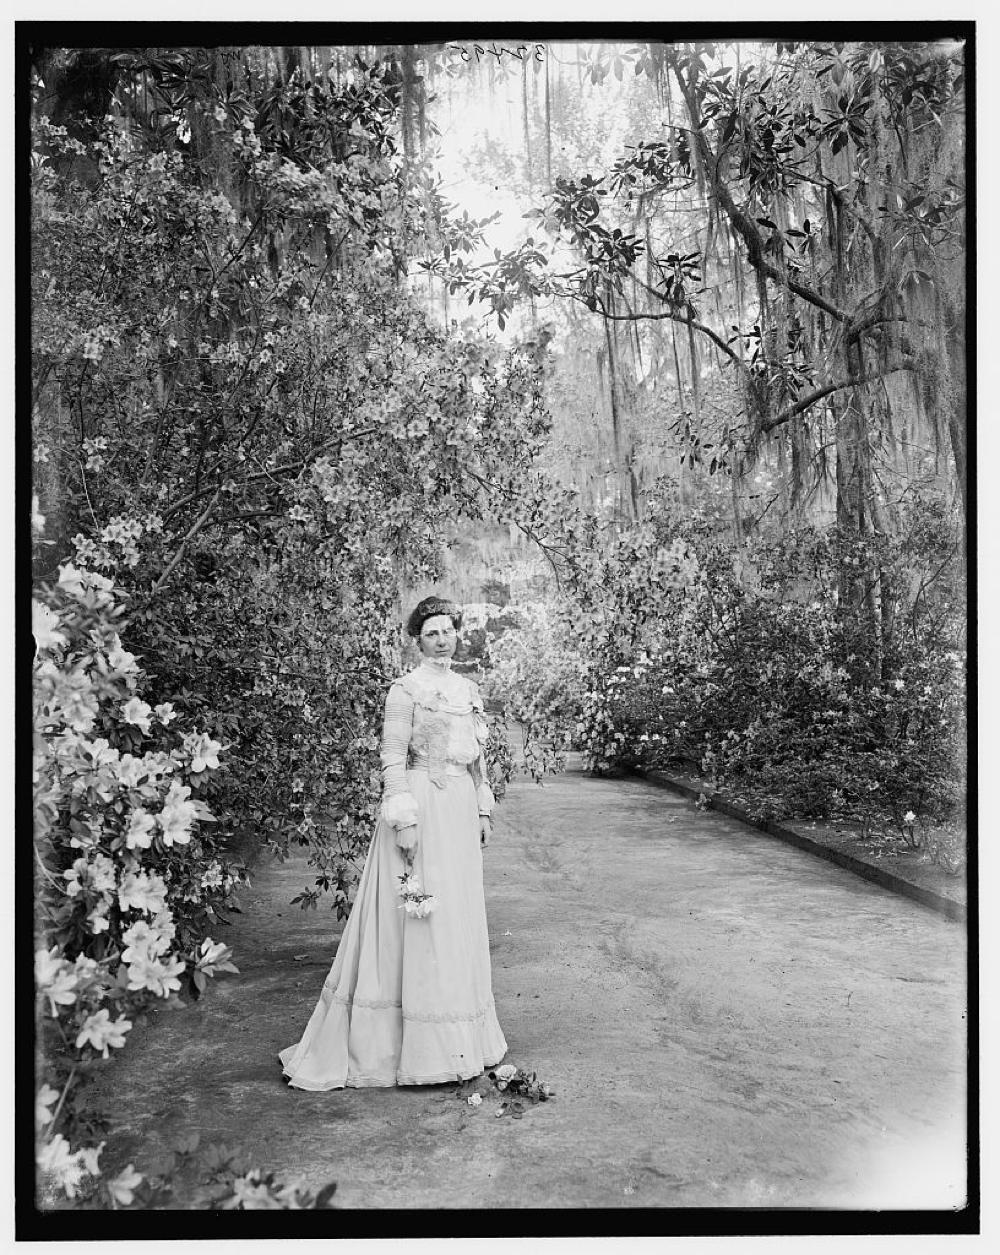 Woman near flowering shrub at Magnolia Gardens, Charleston, S.C